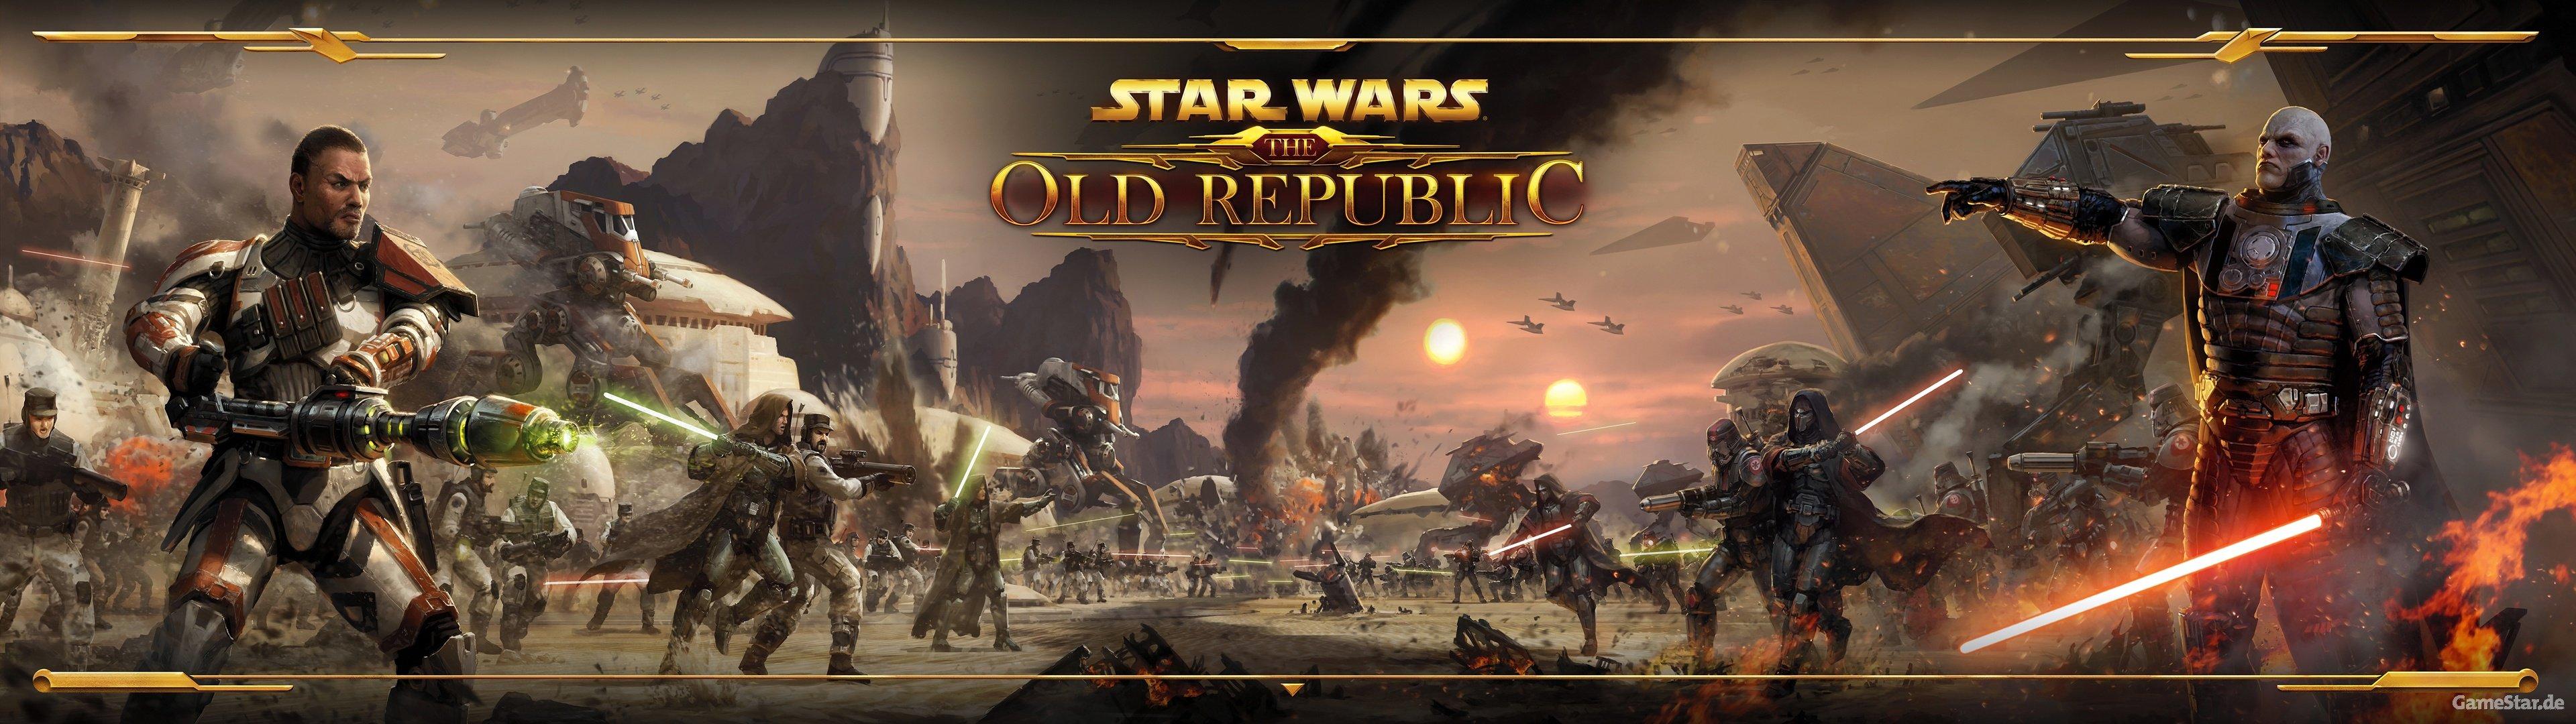 Star Wars Old Republic Mmo Rpg Swtor Fighting Sci Fi